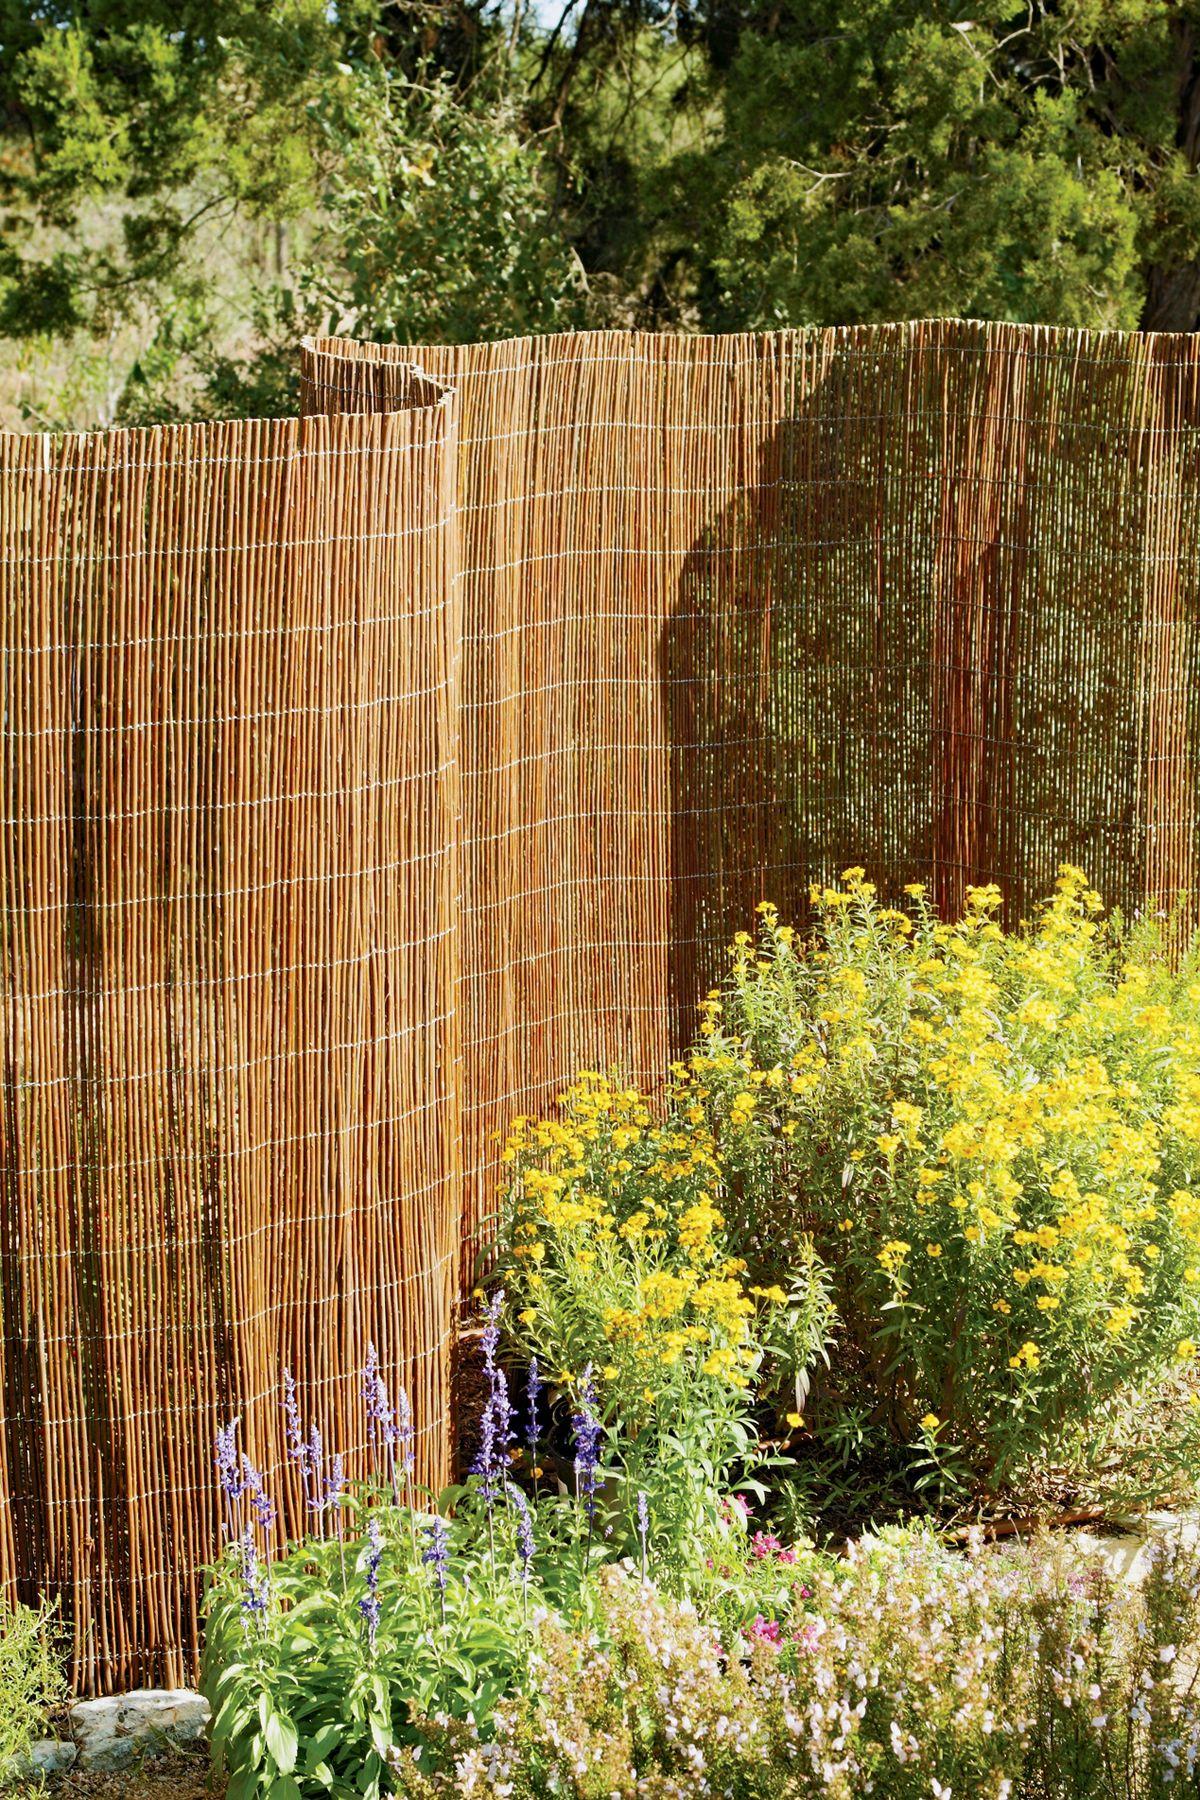 Delightful Bamboo Fencing, Split Bamboo Garden Fence | Gardeneru0027s Supply